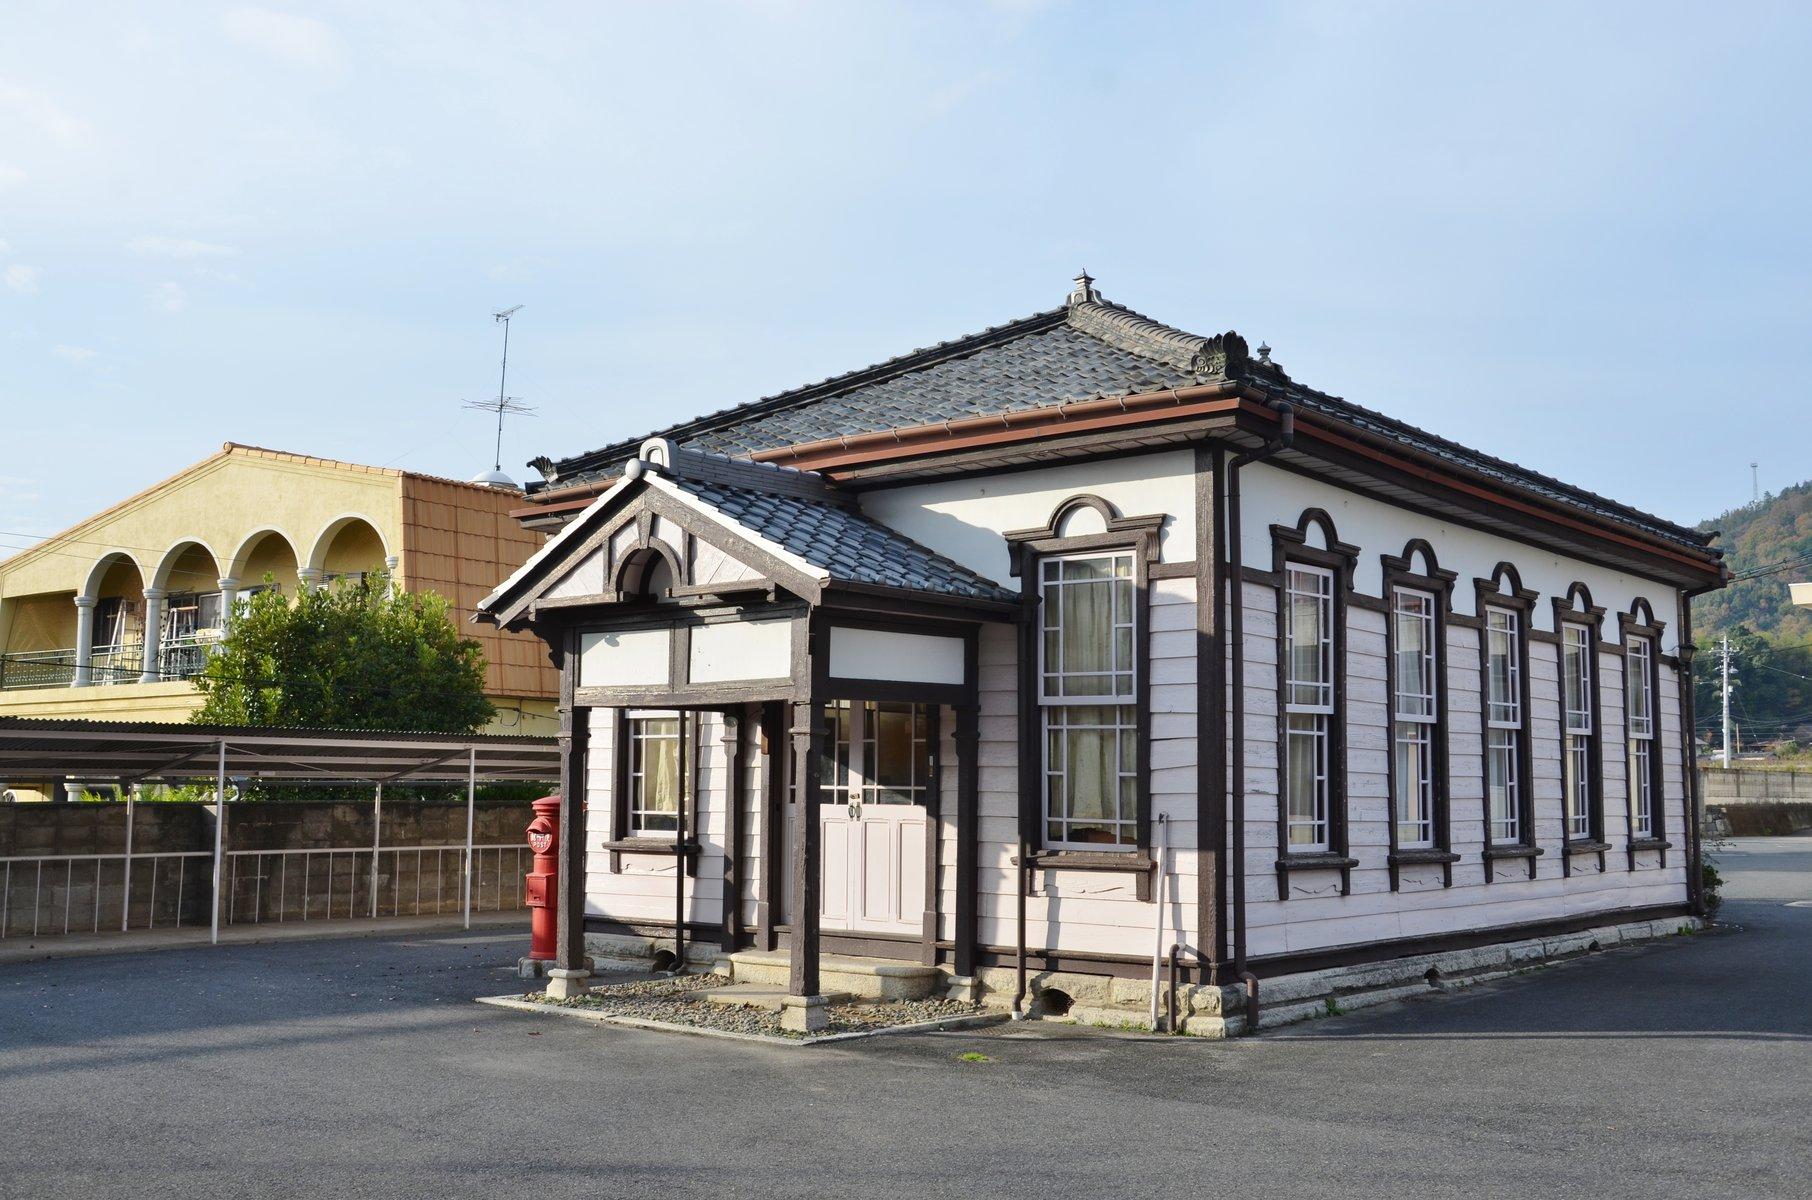 旧制中等教育学校の一覧 - Japan...